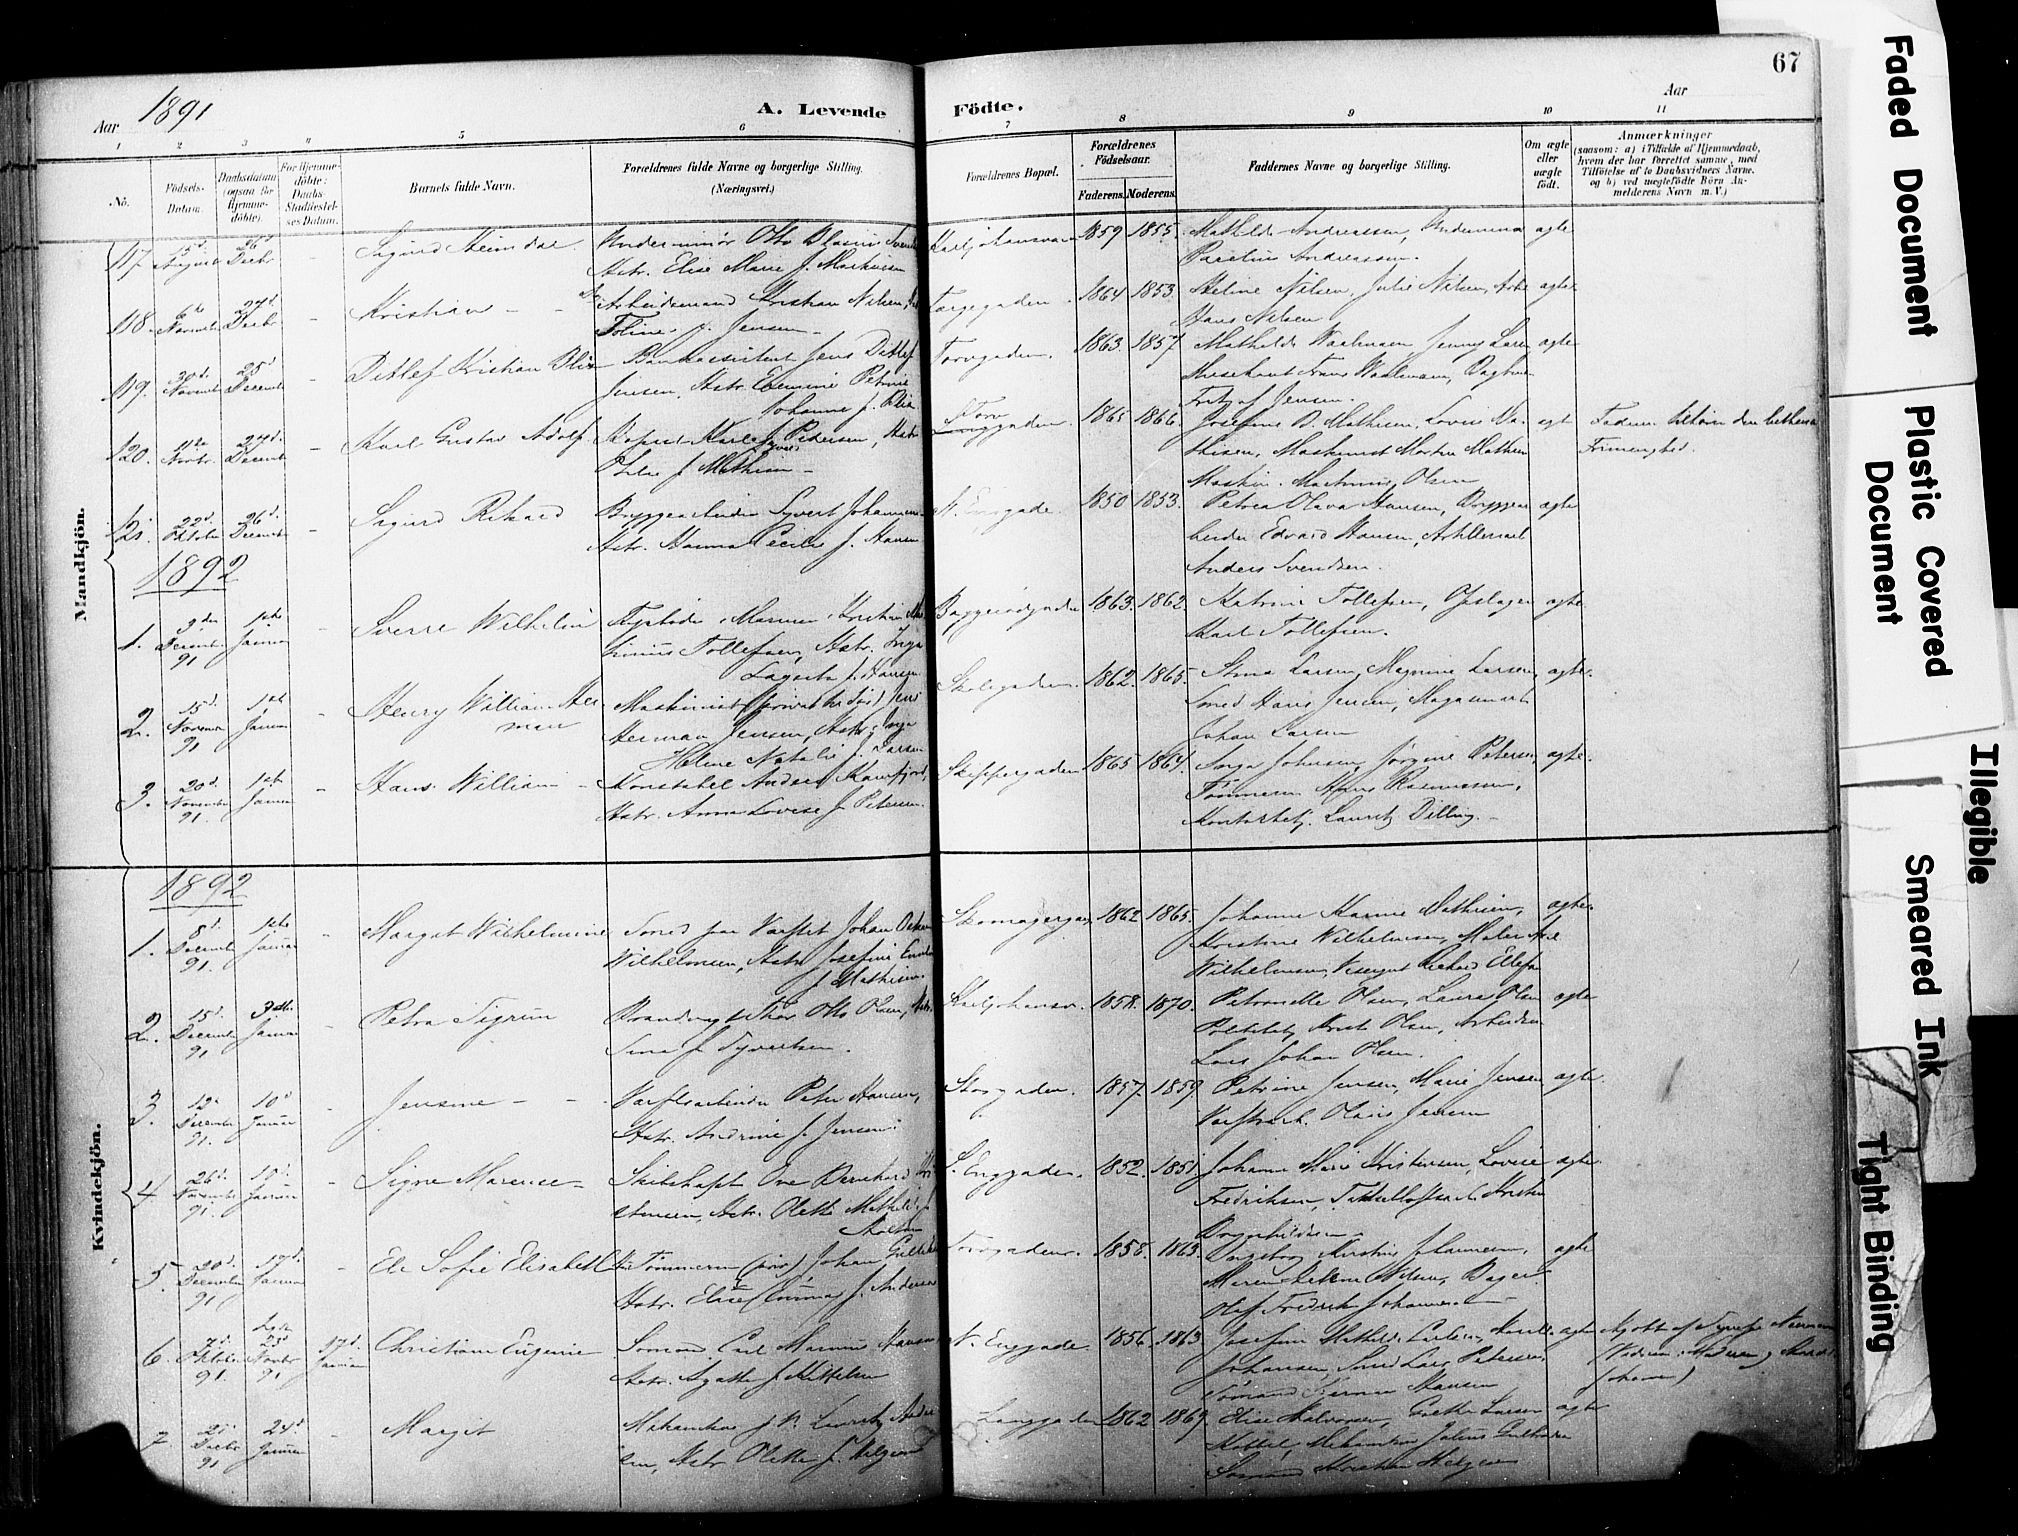 SAKO, Horten kirkebøker, F/Fa/L0004: Parish register (official) no. 4, 1888-1895, p. 67